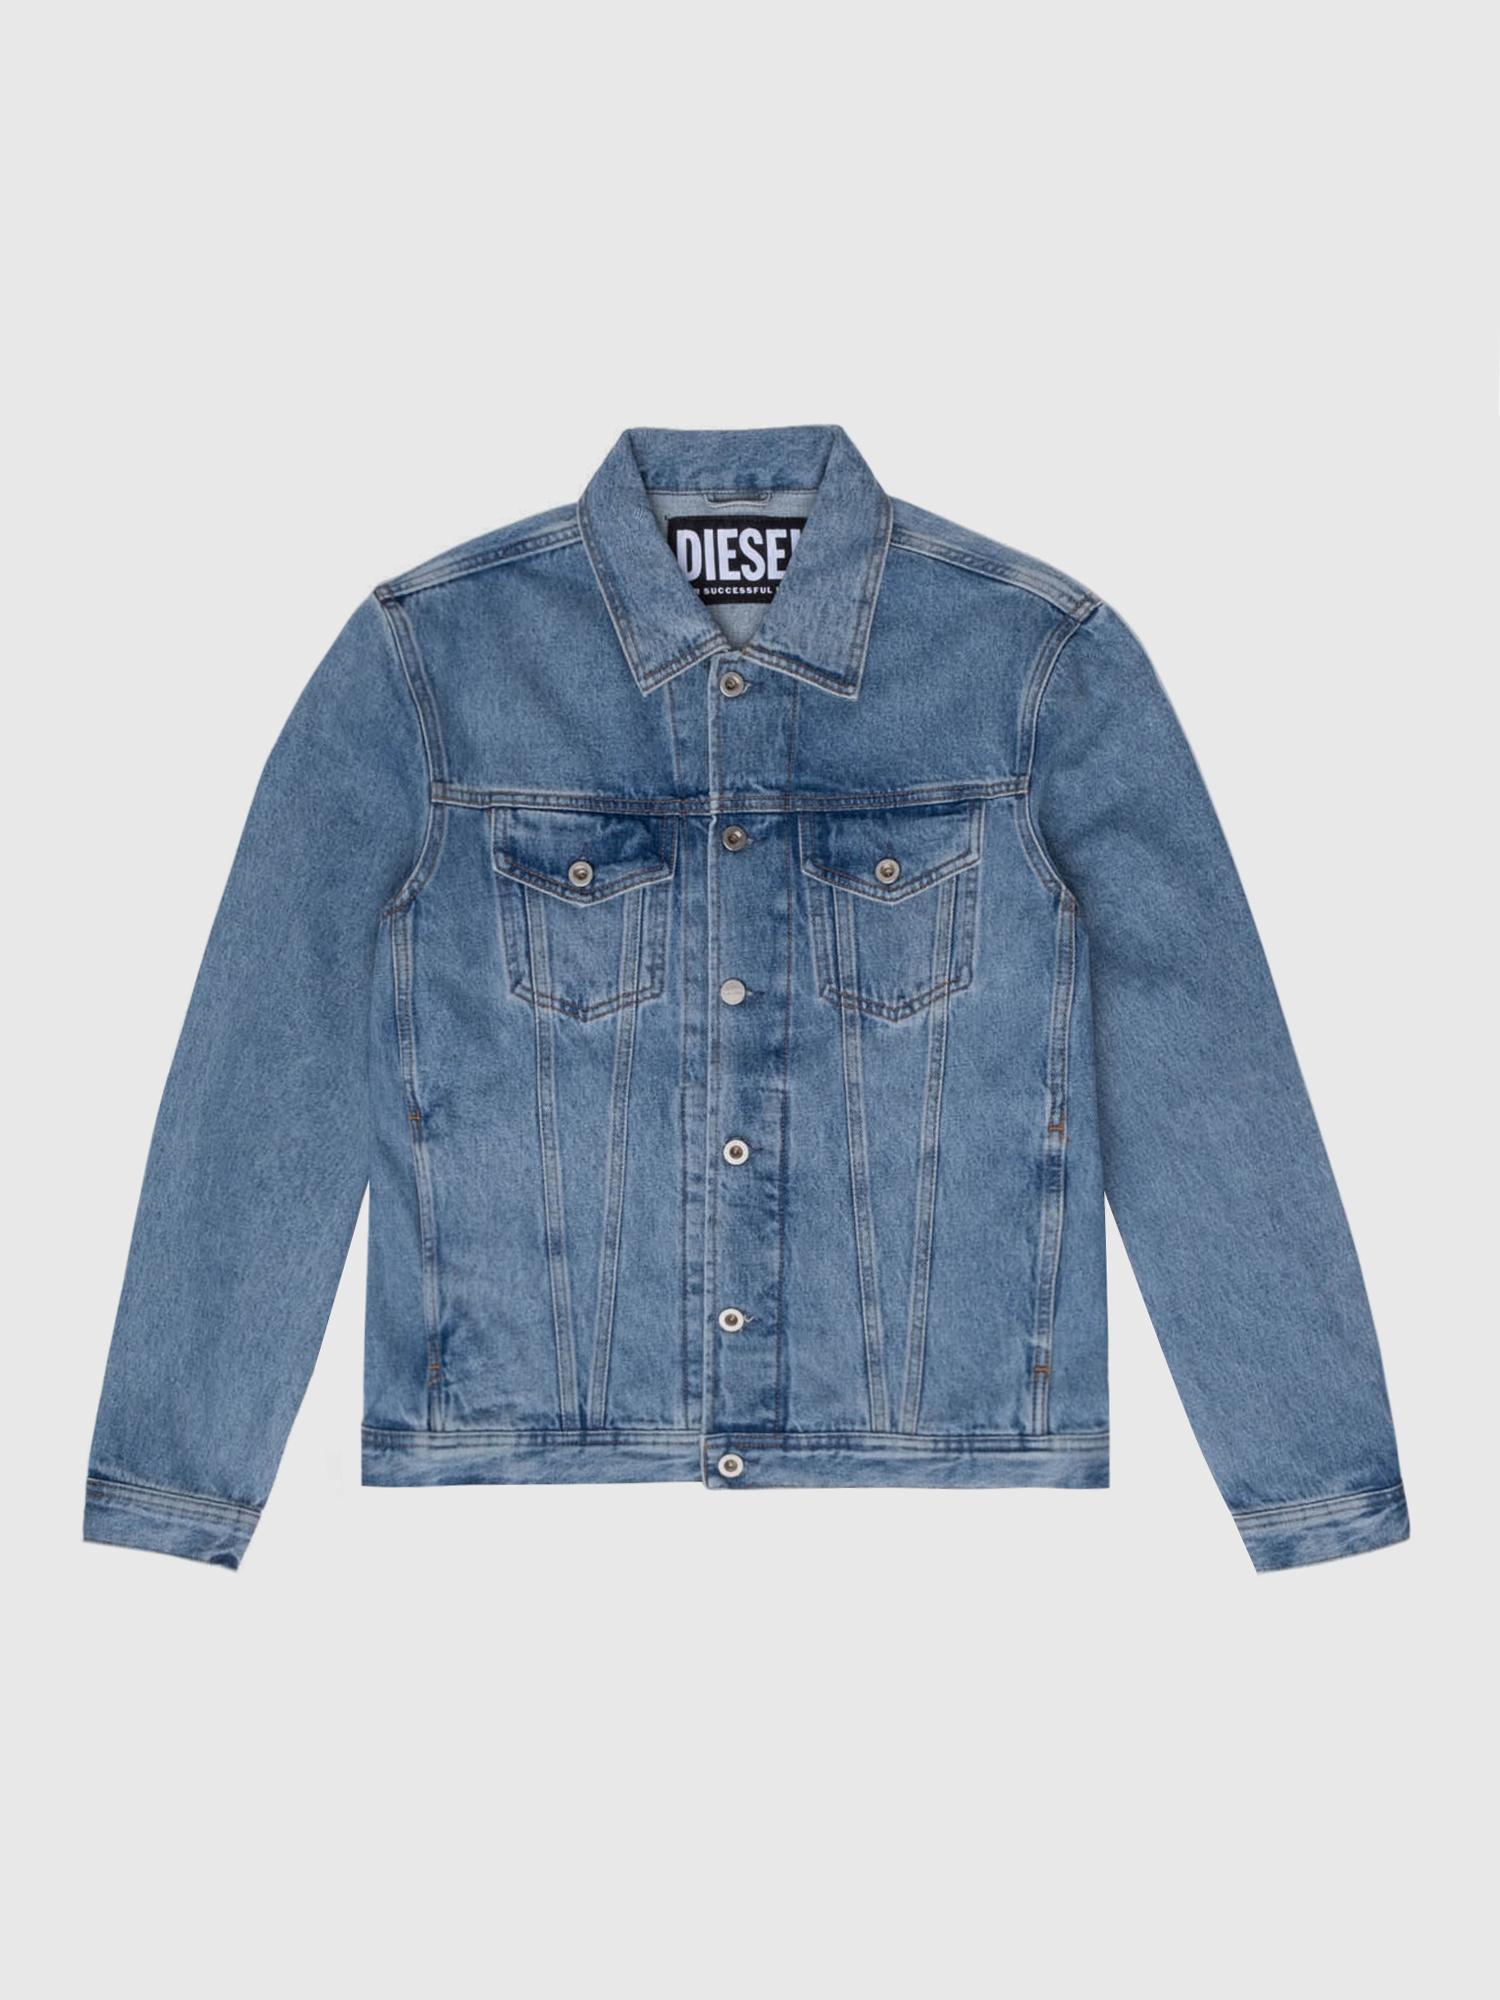 Diesel - US-NHILL-POP1, Medium blue - Denim Jackets - Image 1